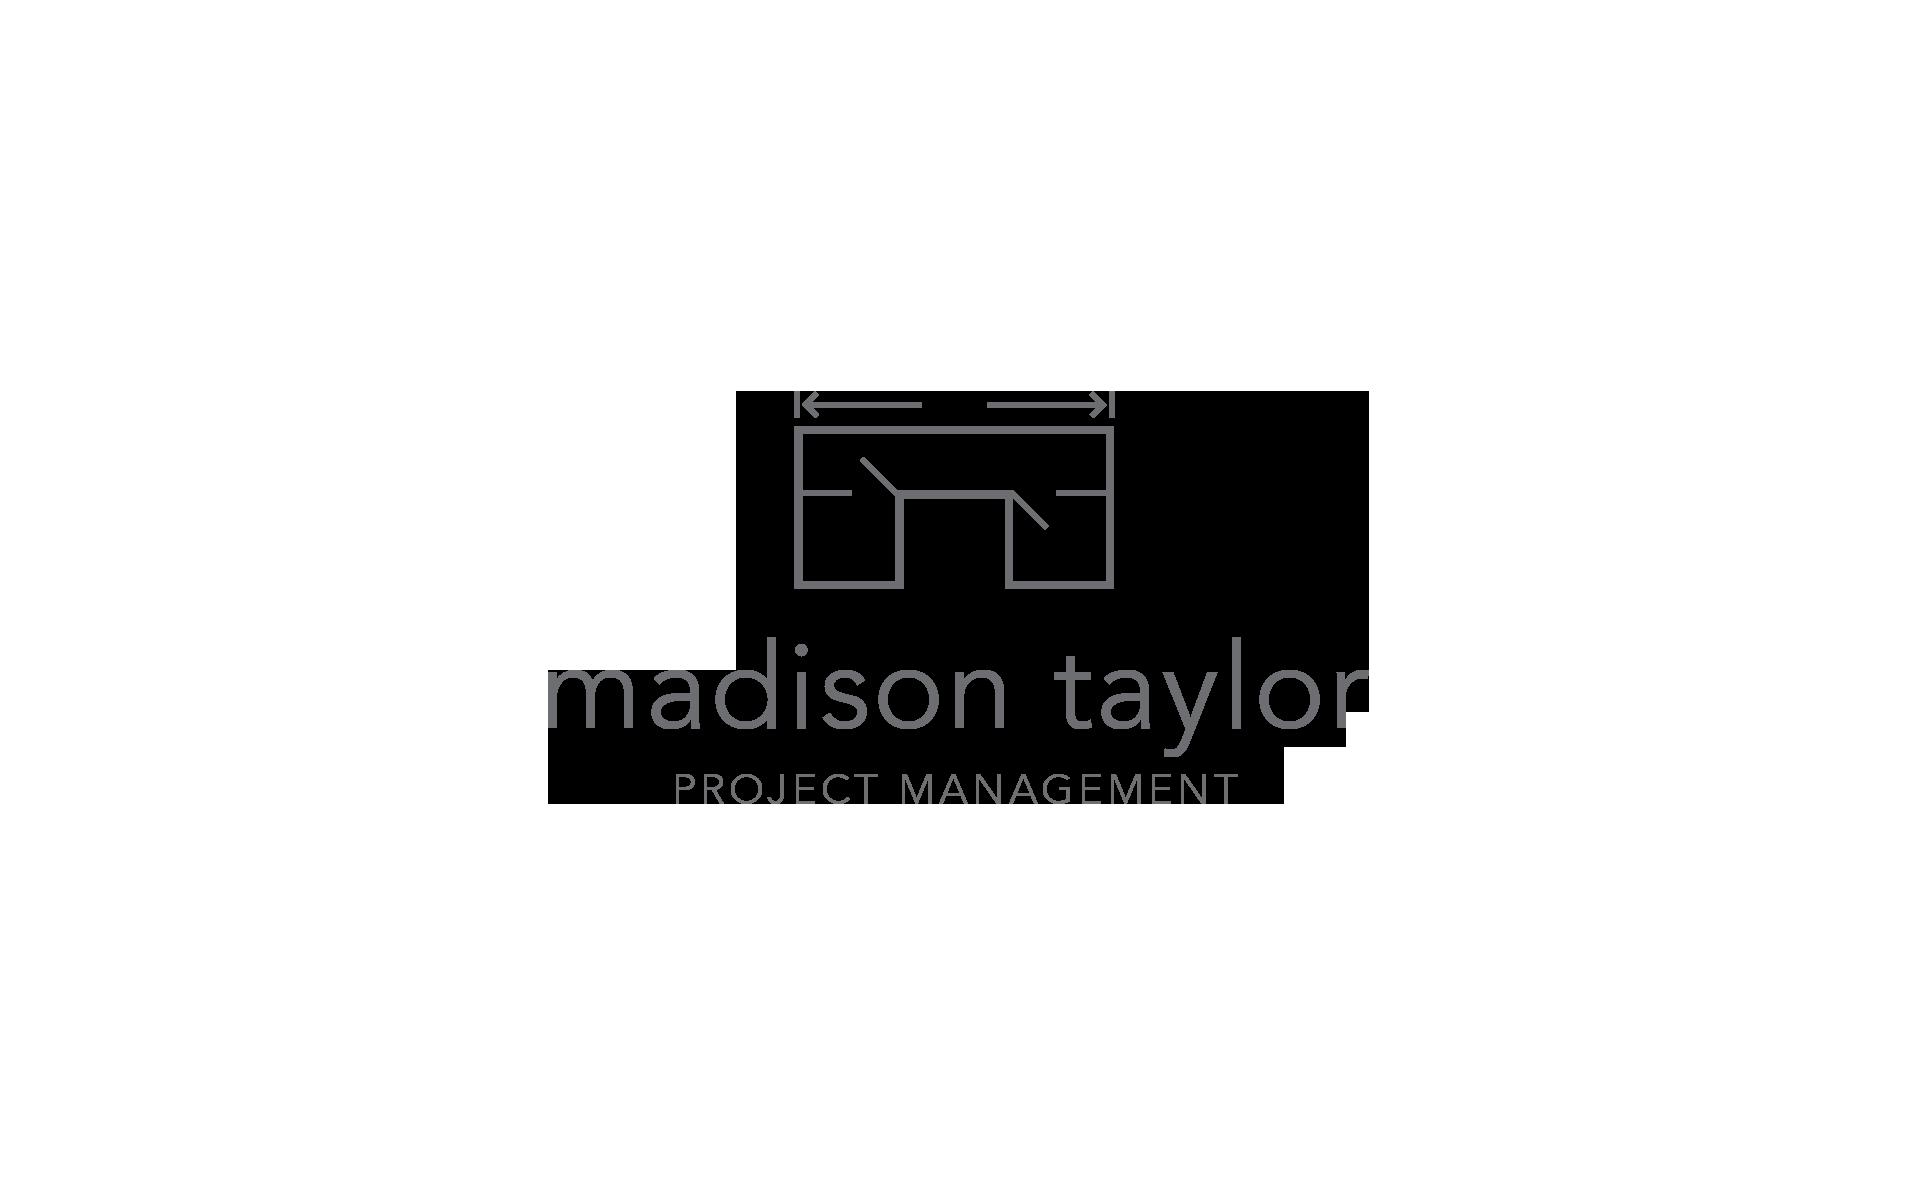 Madison Taylor logo 3